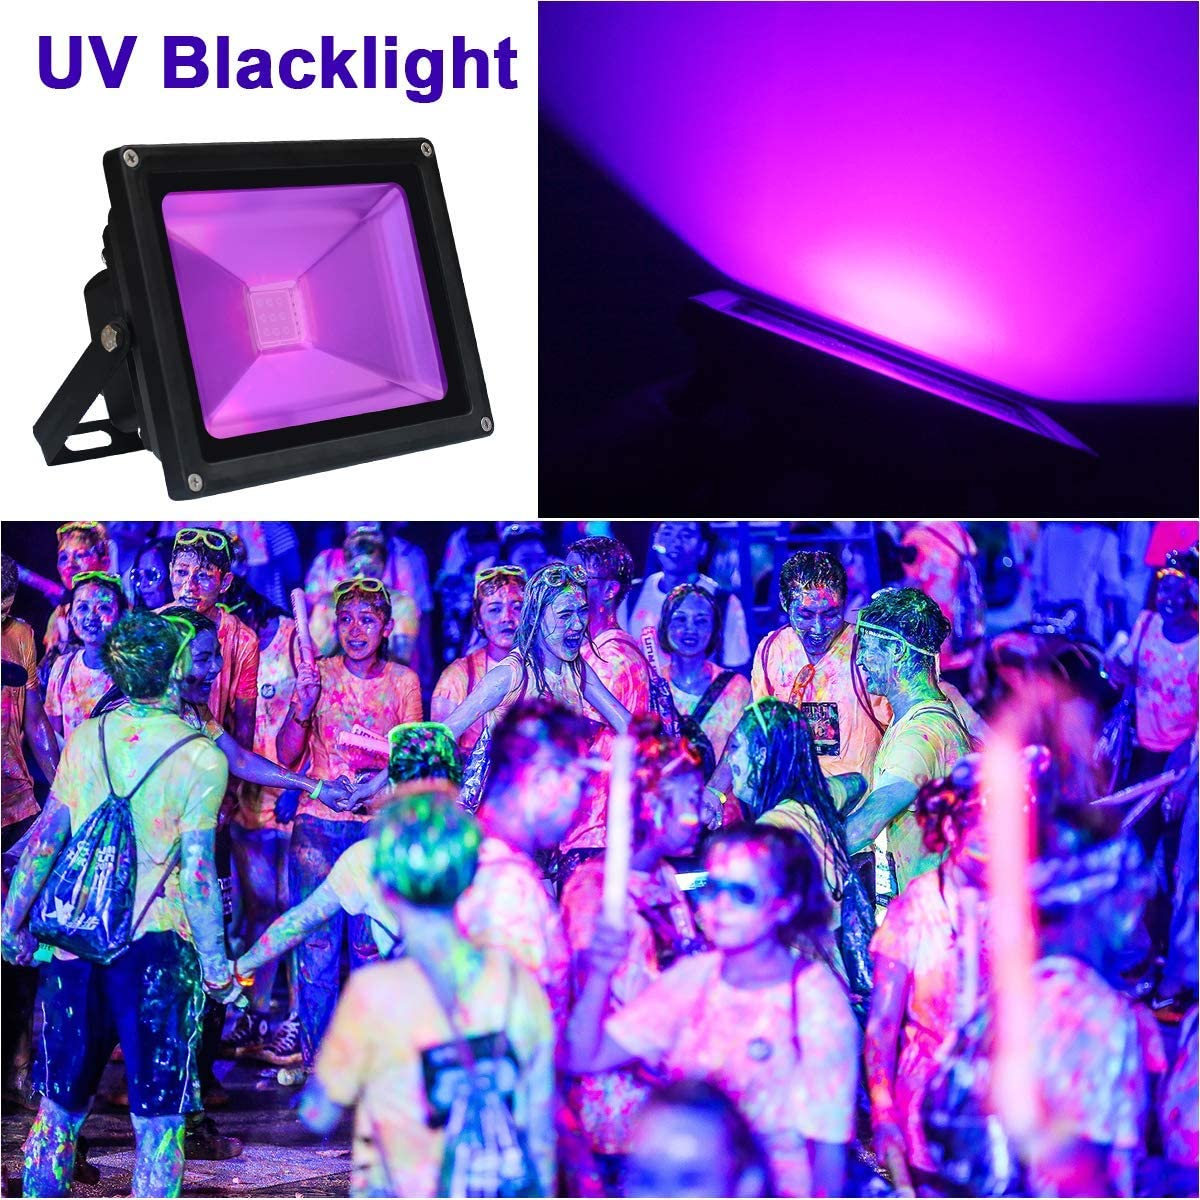 Glow in The Dark LANFU 2 Pack LED Black Light Aquarium High Power 60w LED Flood Light IP65-Waterproof 85V-265V AC for Blacklight Party Supplies Neon Glow Fishing Curing